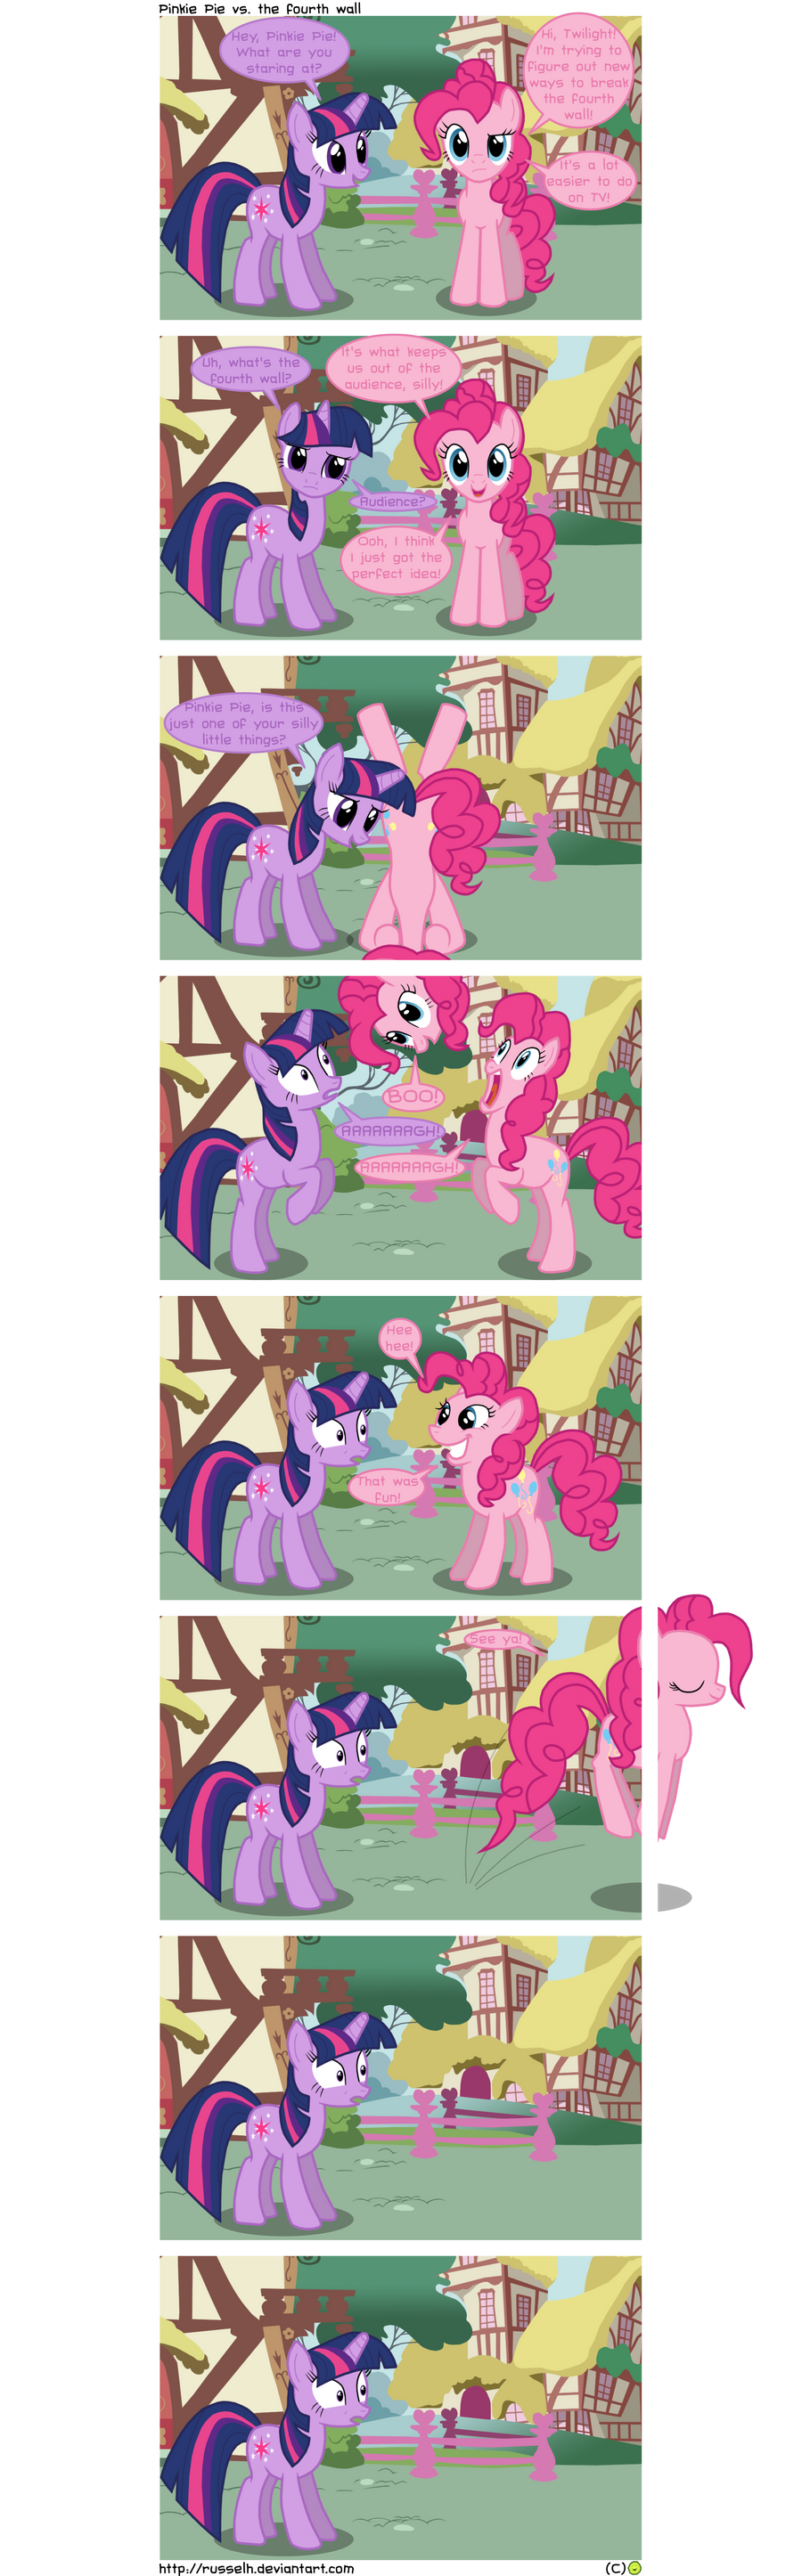 Pinkie Pie vs. the fourth wall